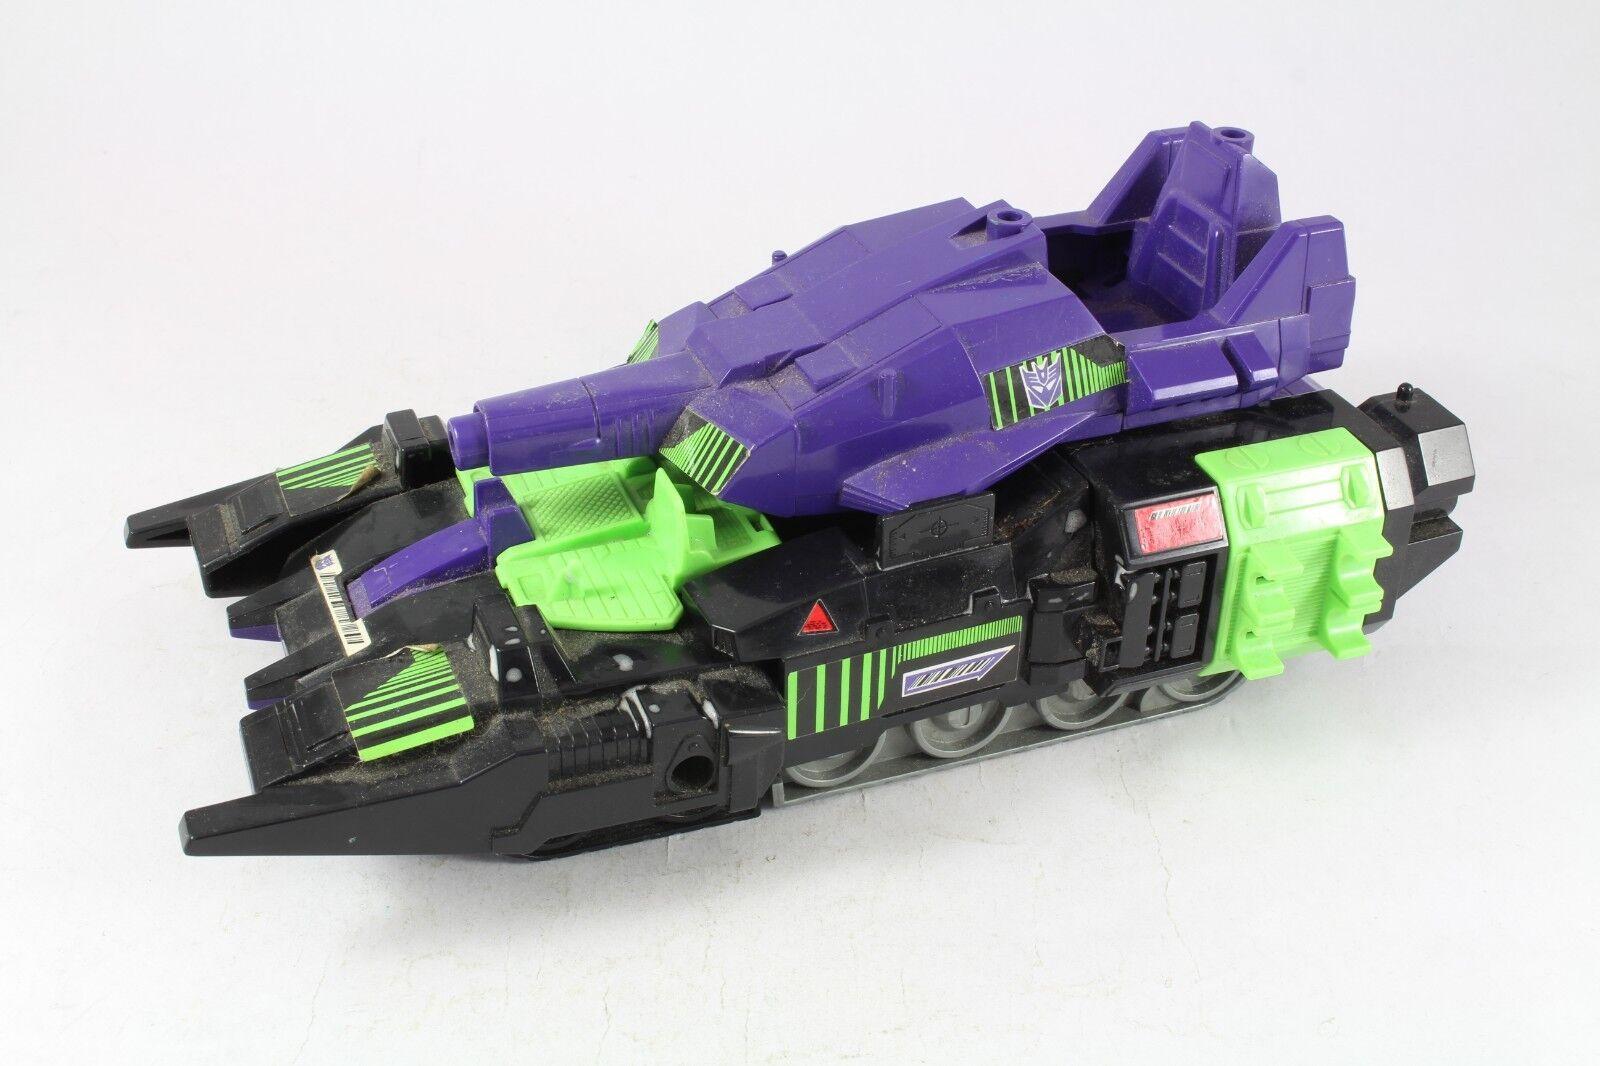 Transformers G1 G1 G1 Action Masters Megatron Neutro Fusion Tank (no accessories) 157811